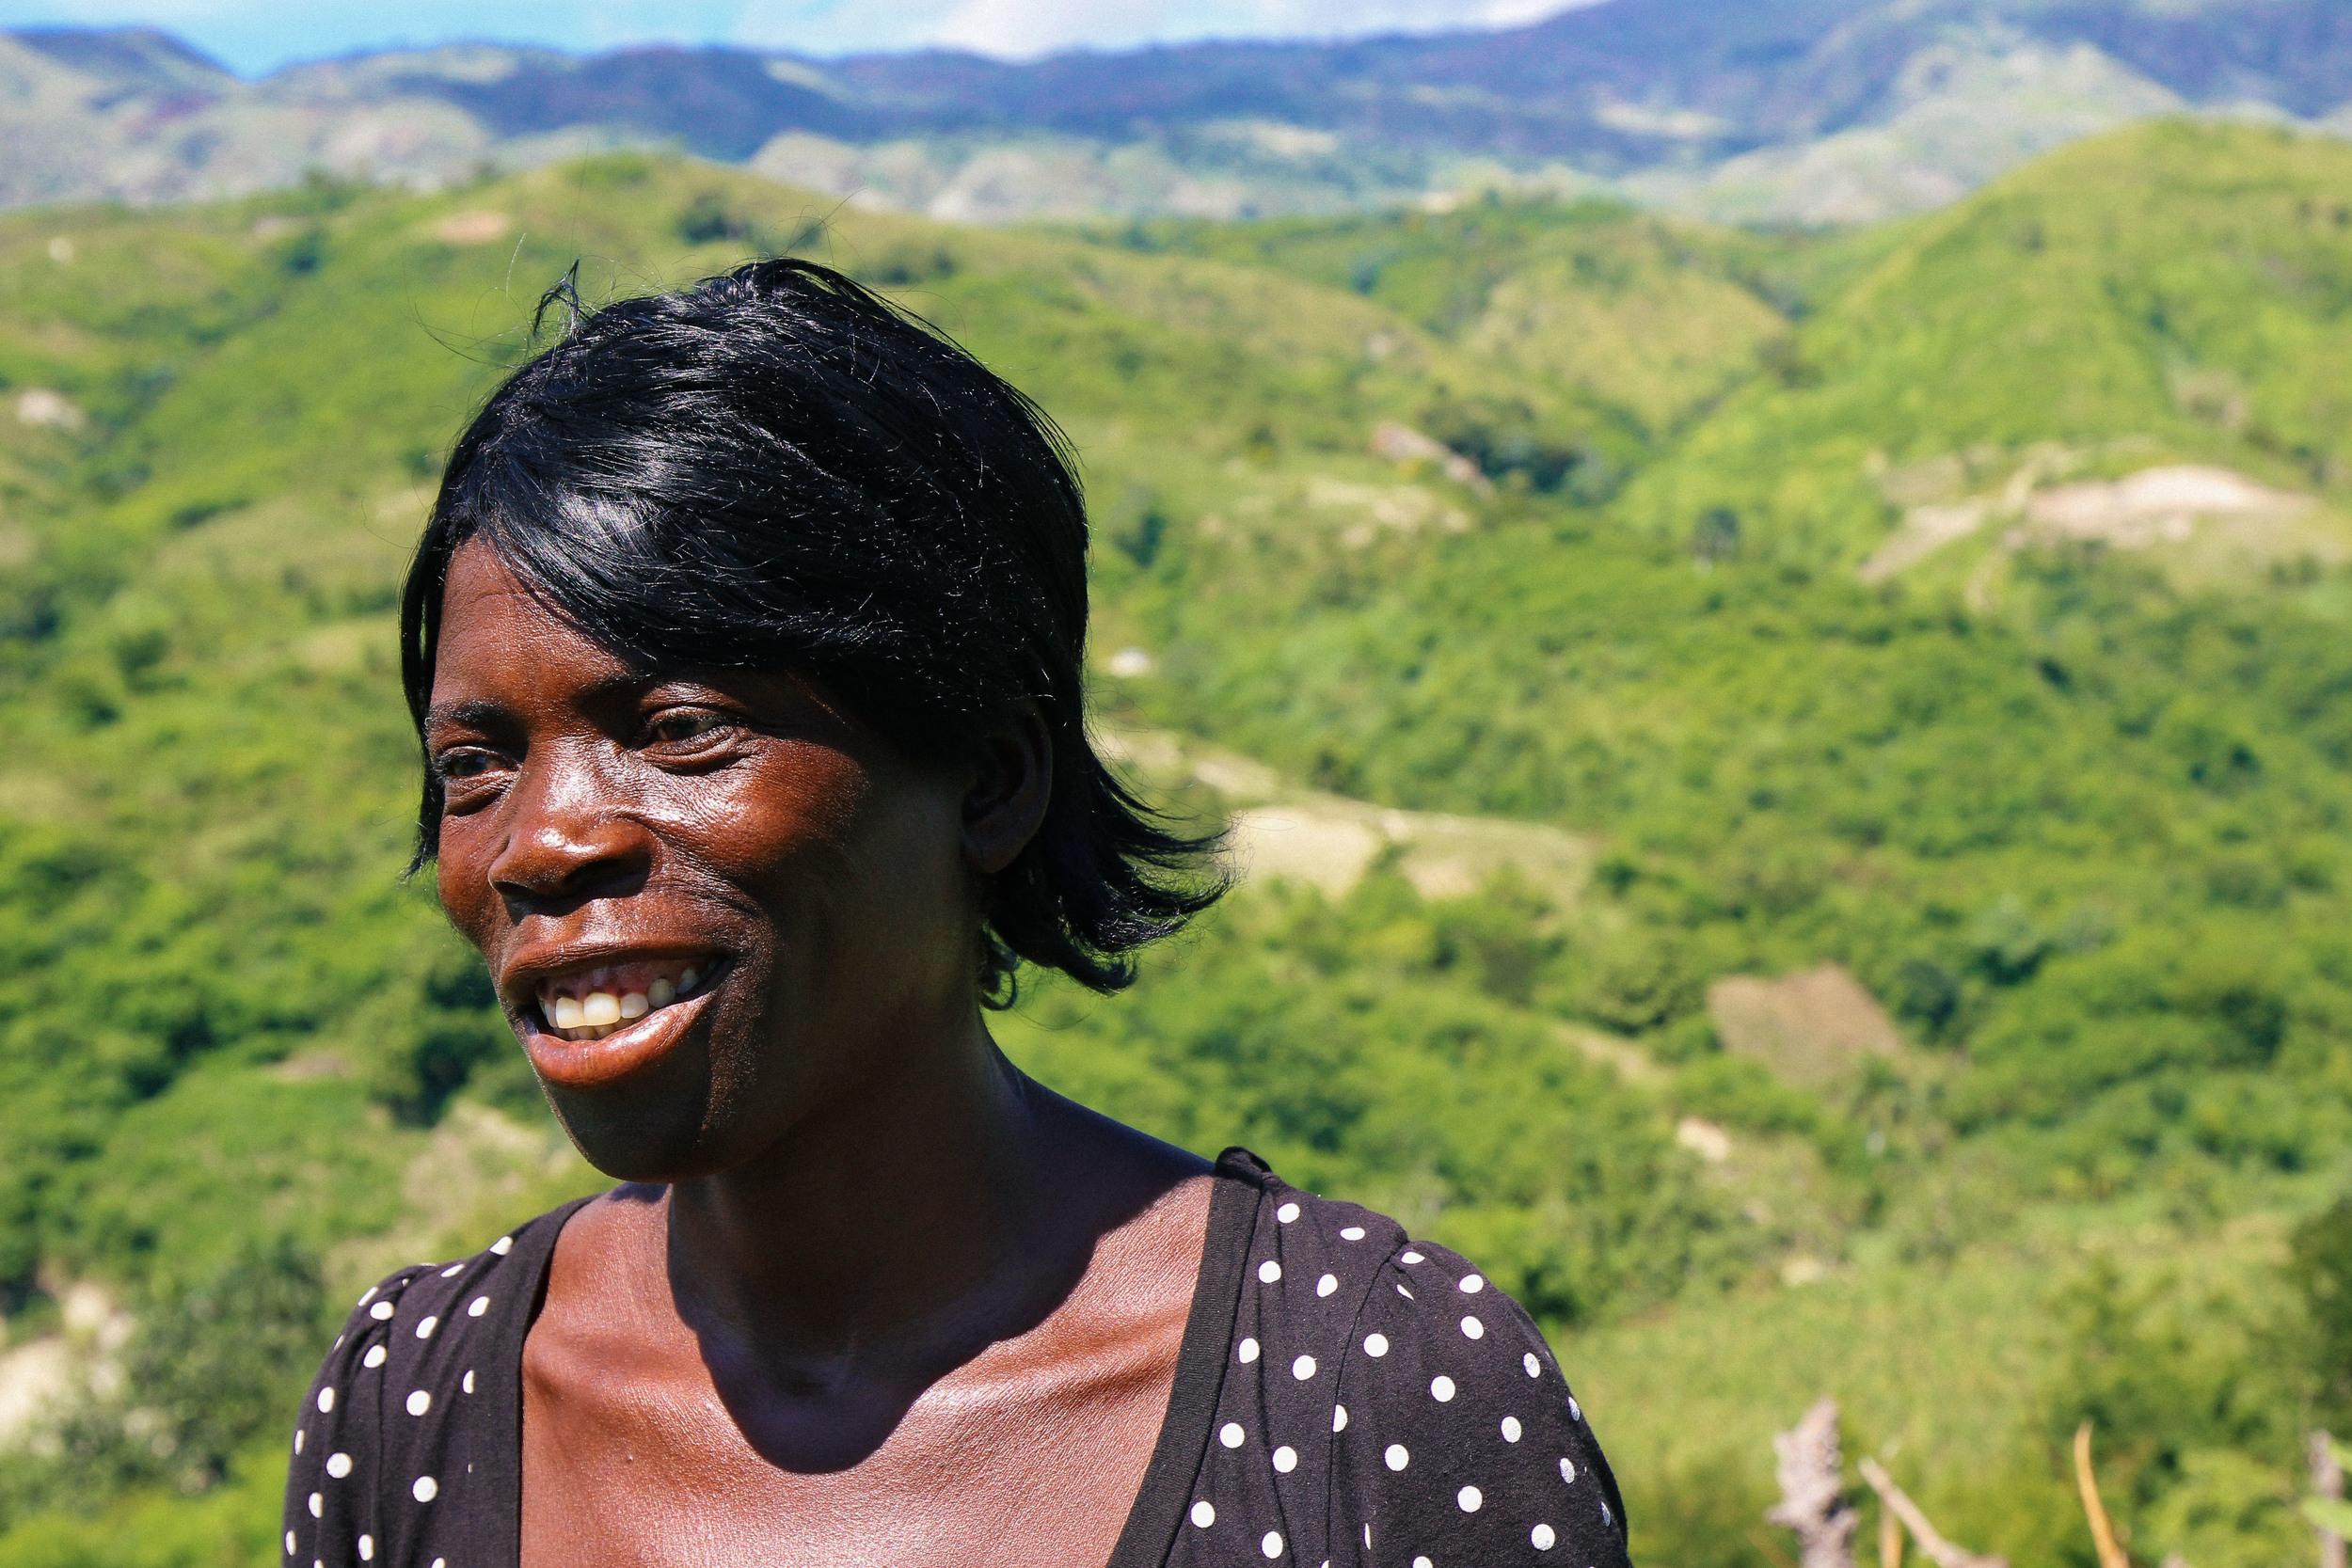 St. Abel Pierre is the treasurer for the peasant farming group Avansman Lavi Kabay.